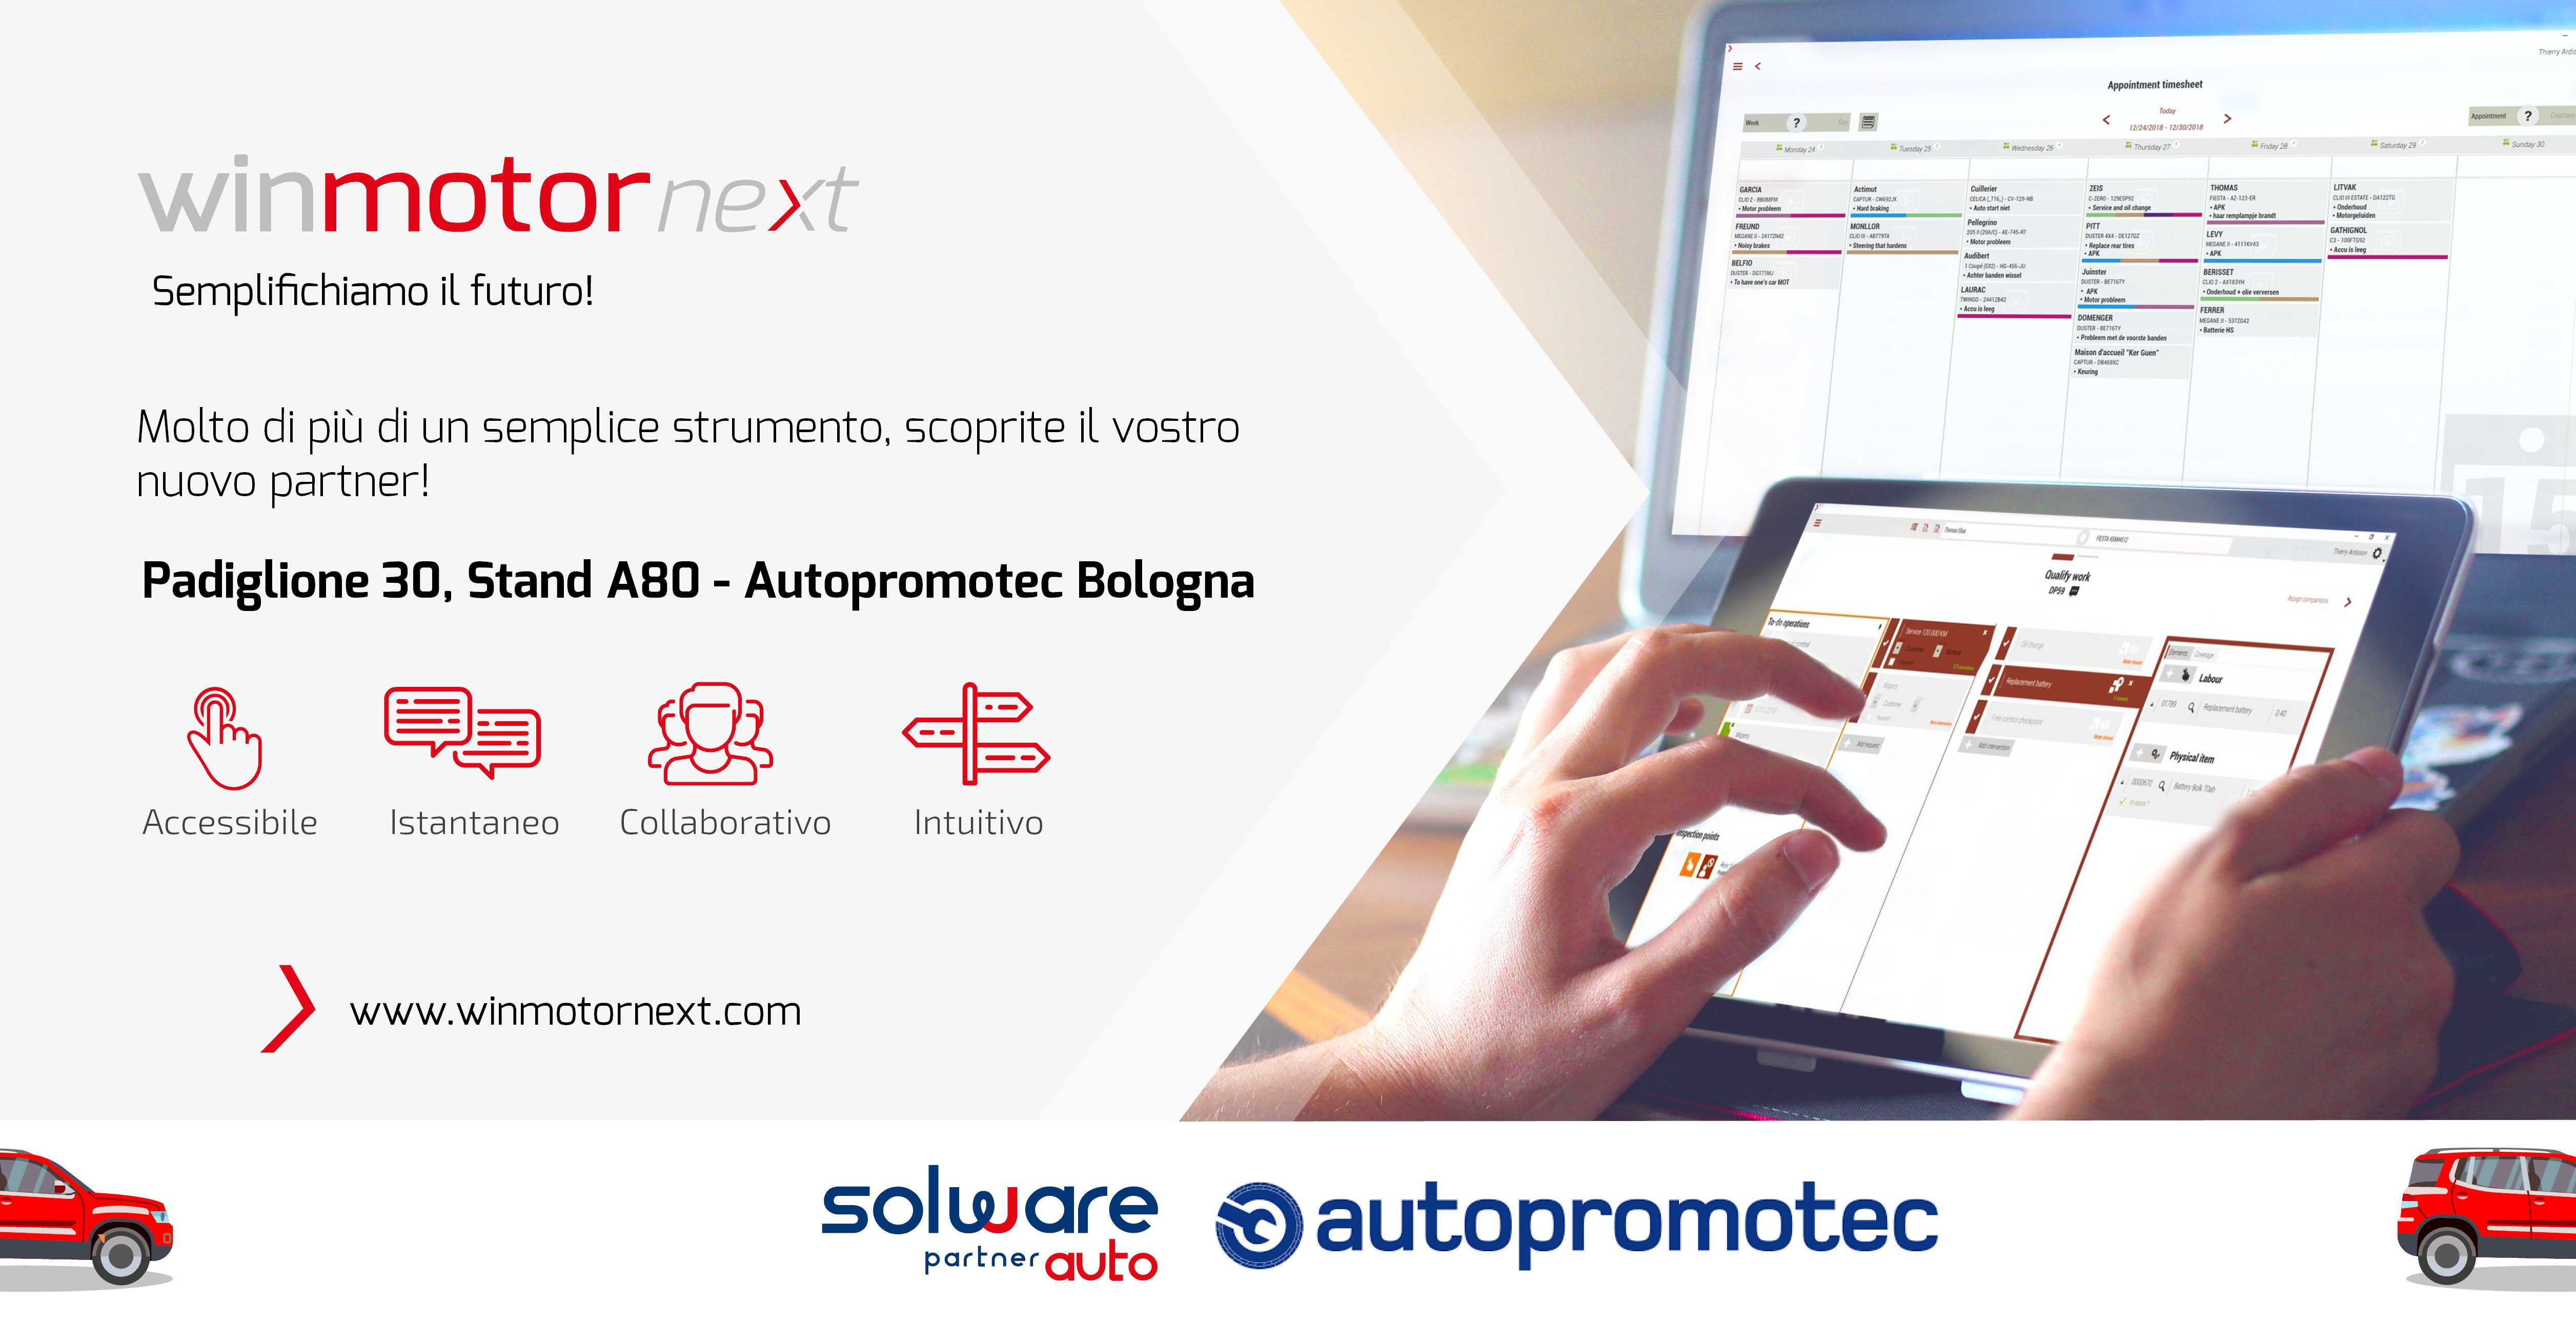 Solware Auto Autopromotec Bologna winmotor next